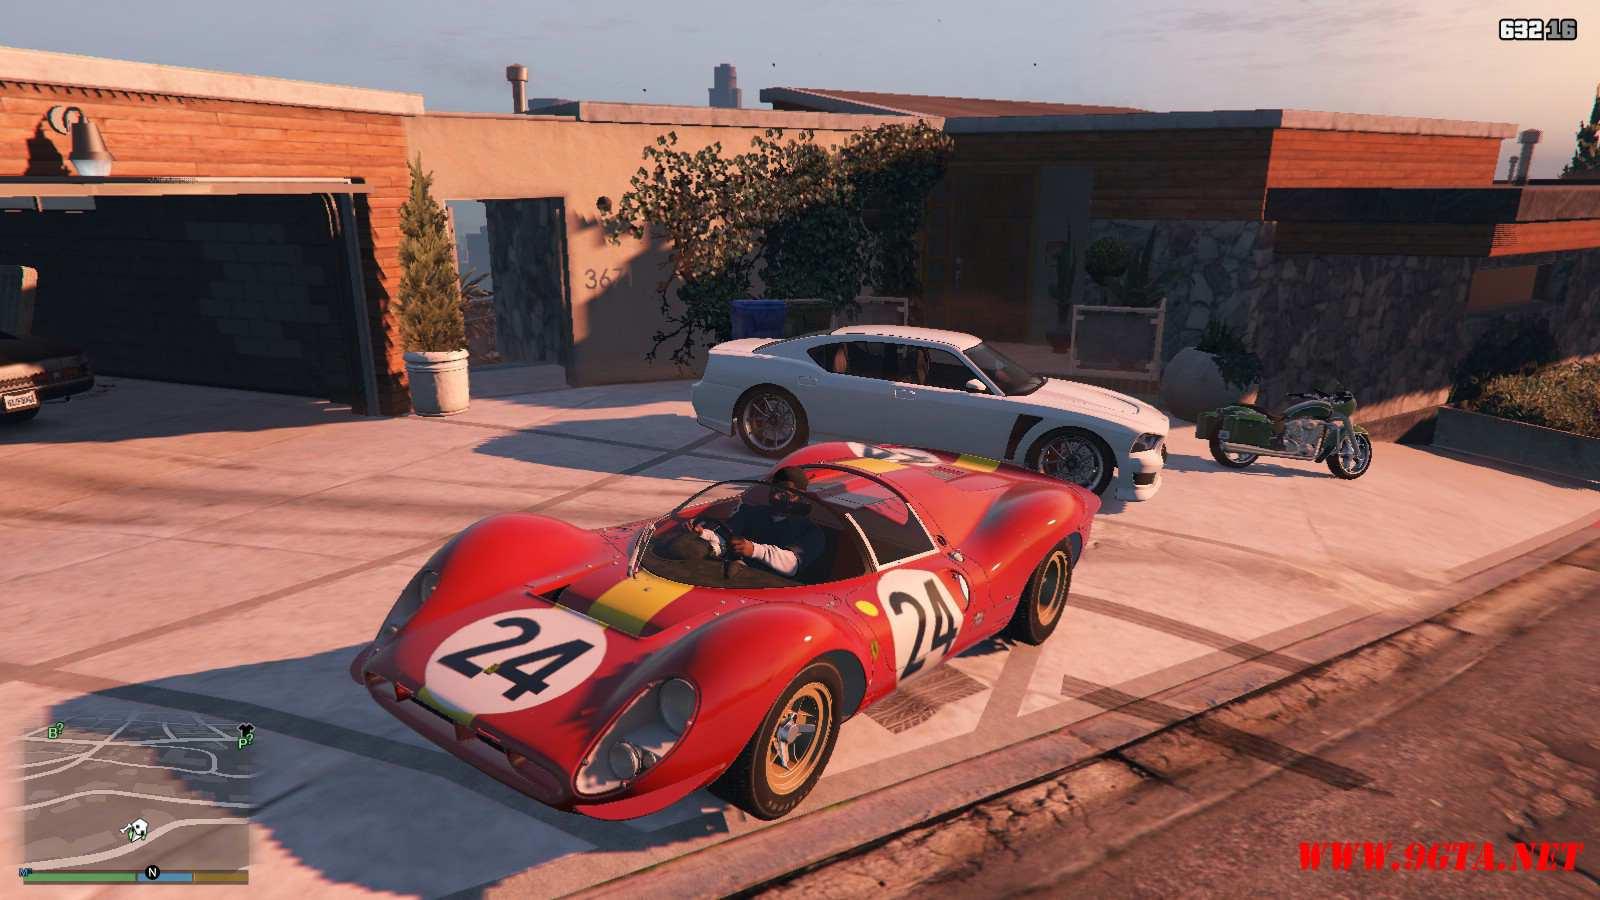 1967 Ferrari 330 P4 GTA5 Mods (6)